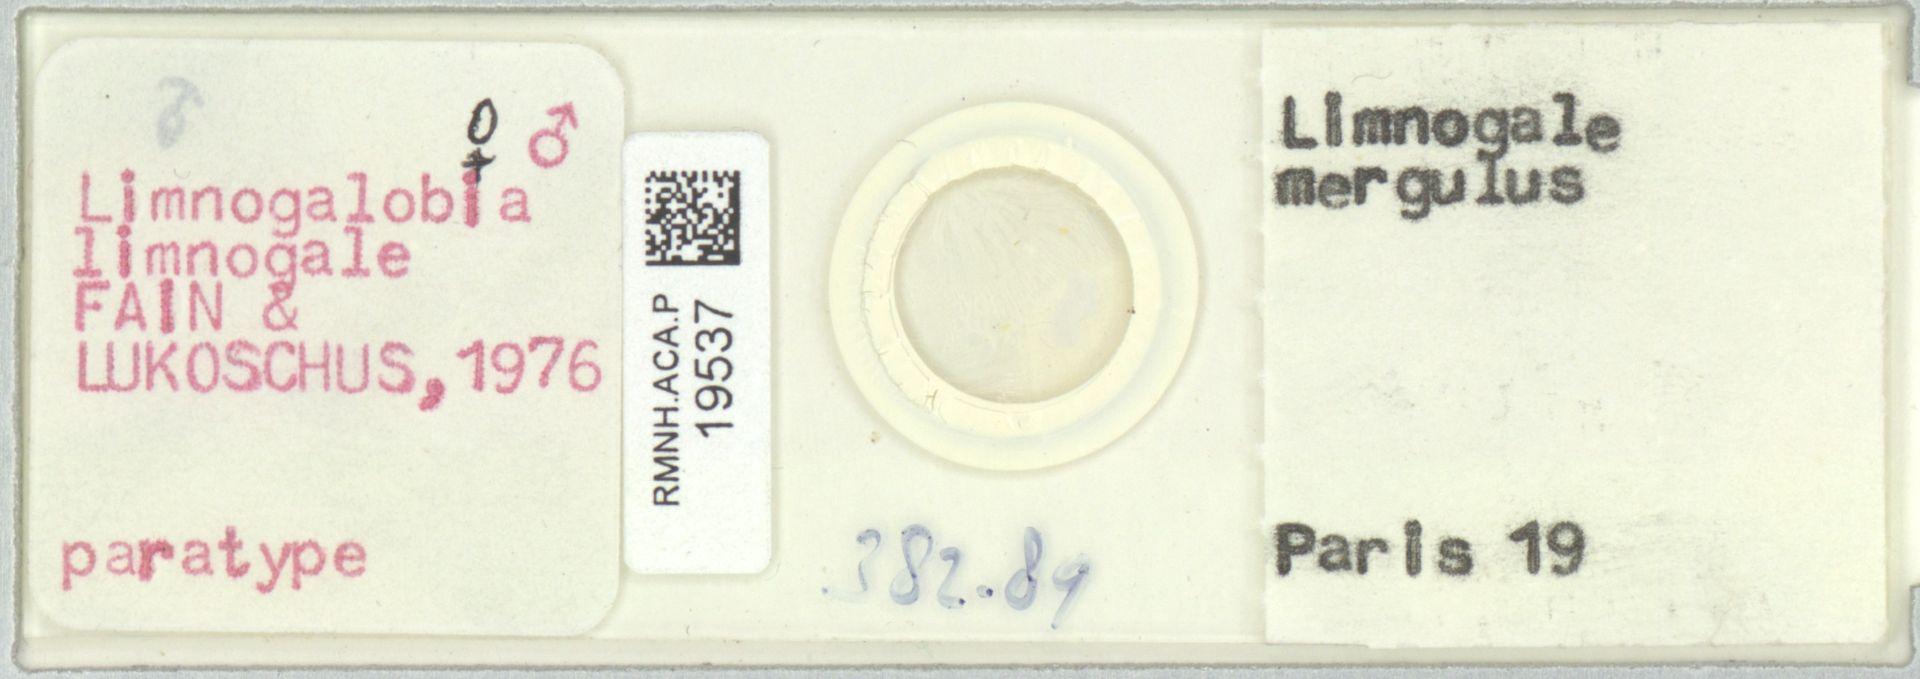 RMNH.ACA.P.19537 | Limnogalobia limnogale